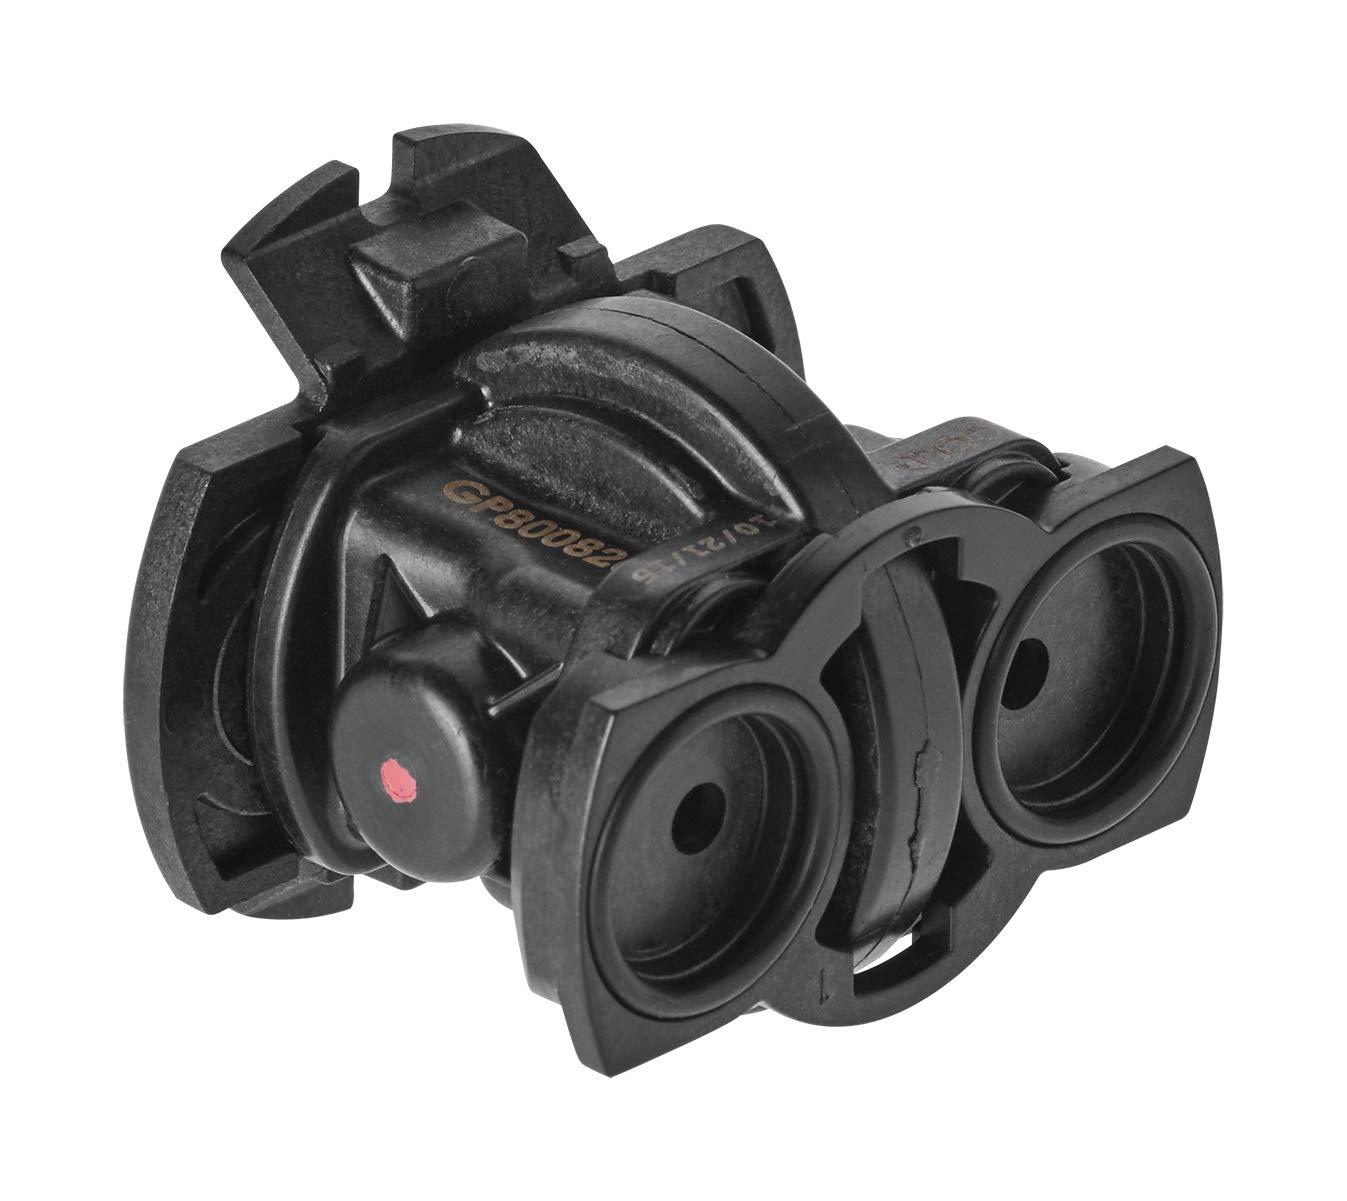 Kohler Part GP800820 Rite-Temp Pressure-Balancing Unit Cartridge, Black by Kohler (Image #1)